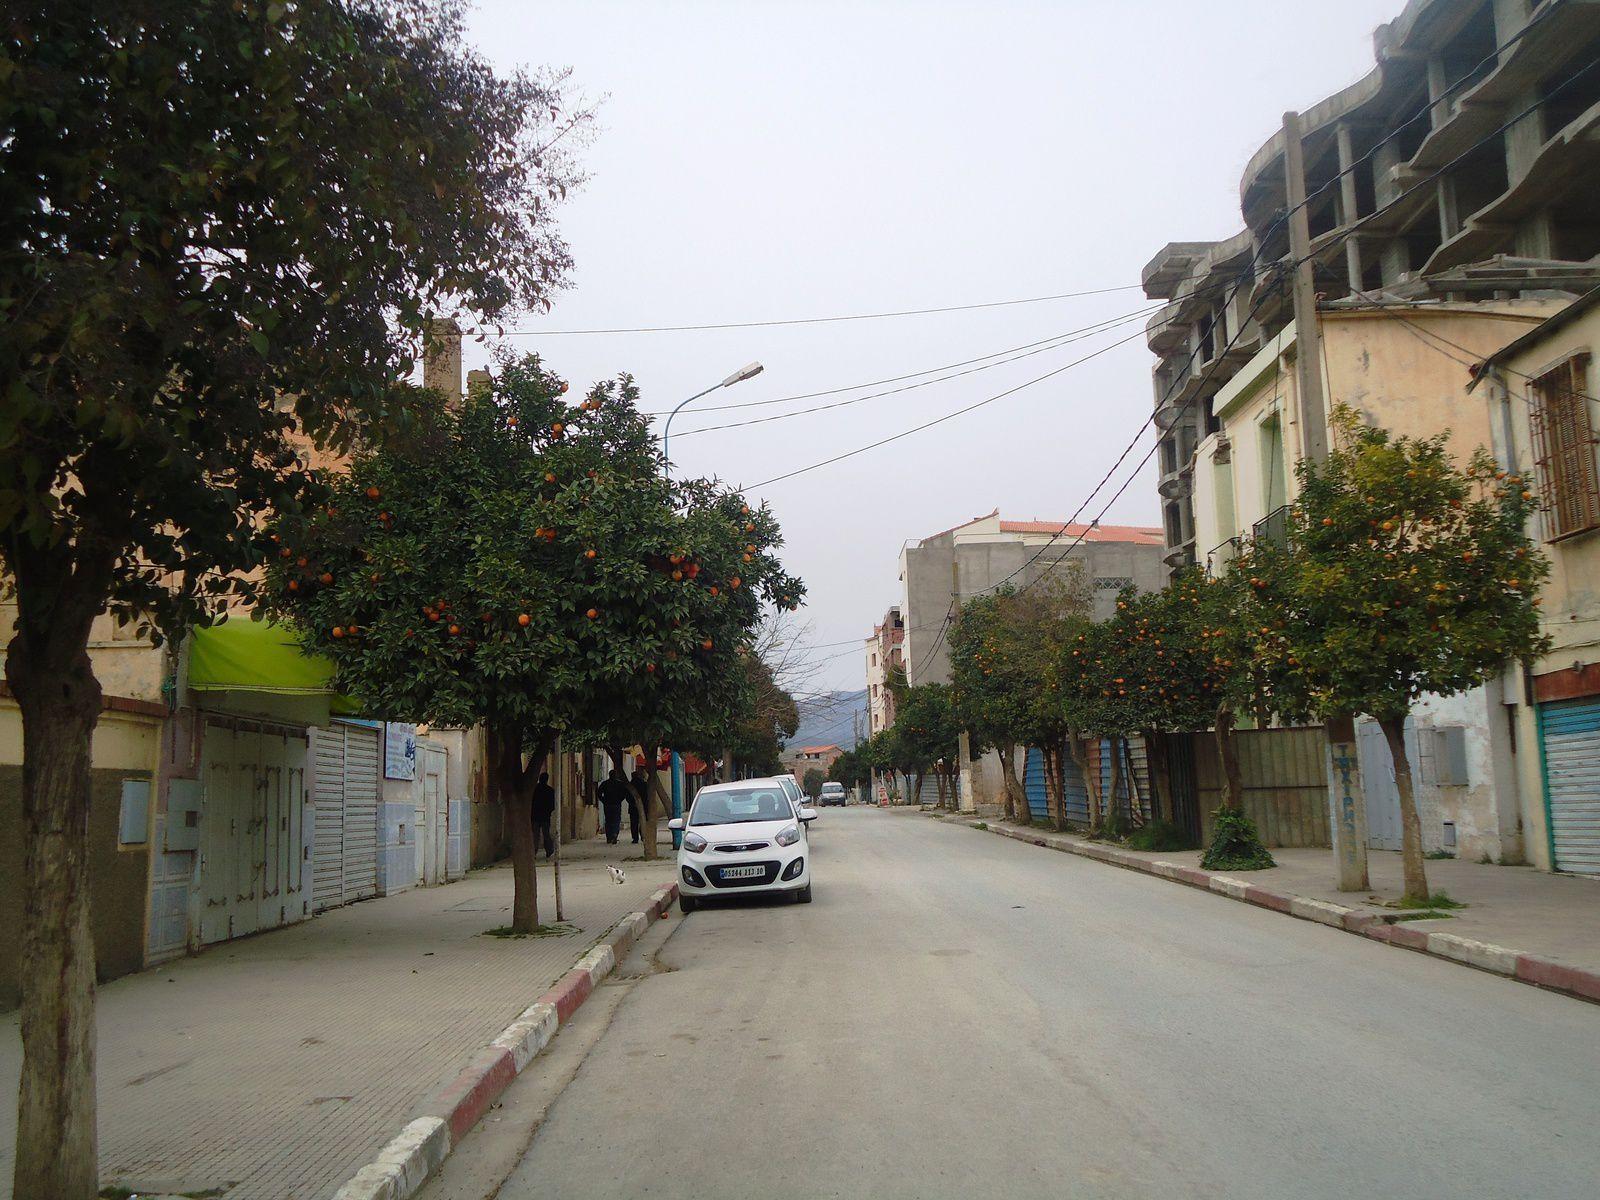 Une vue Bouira ,un jour de vendredi . صورة من مدينة البويرة في يوم جمعة